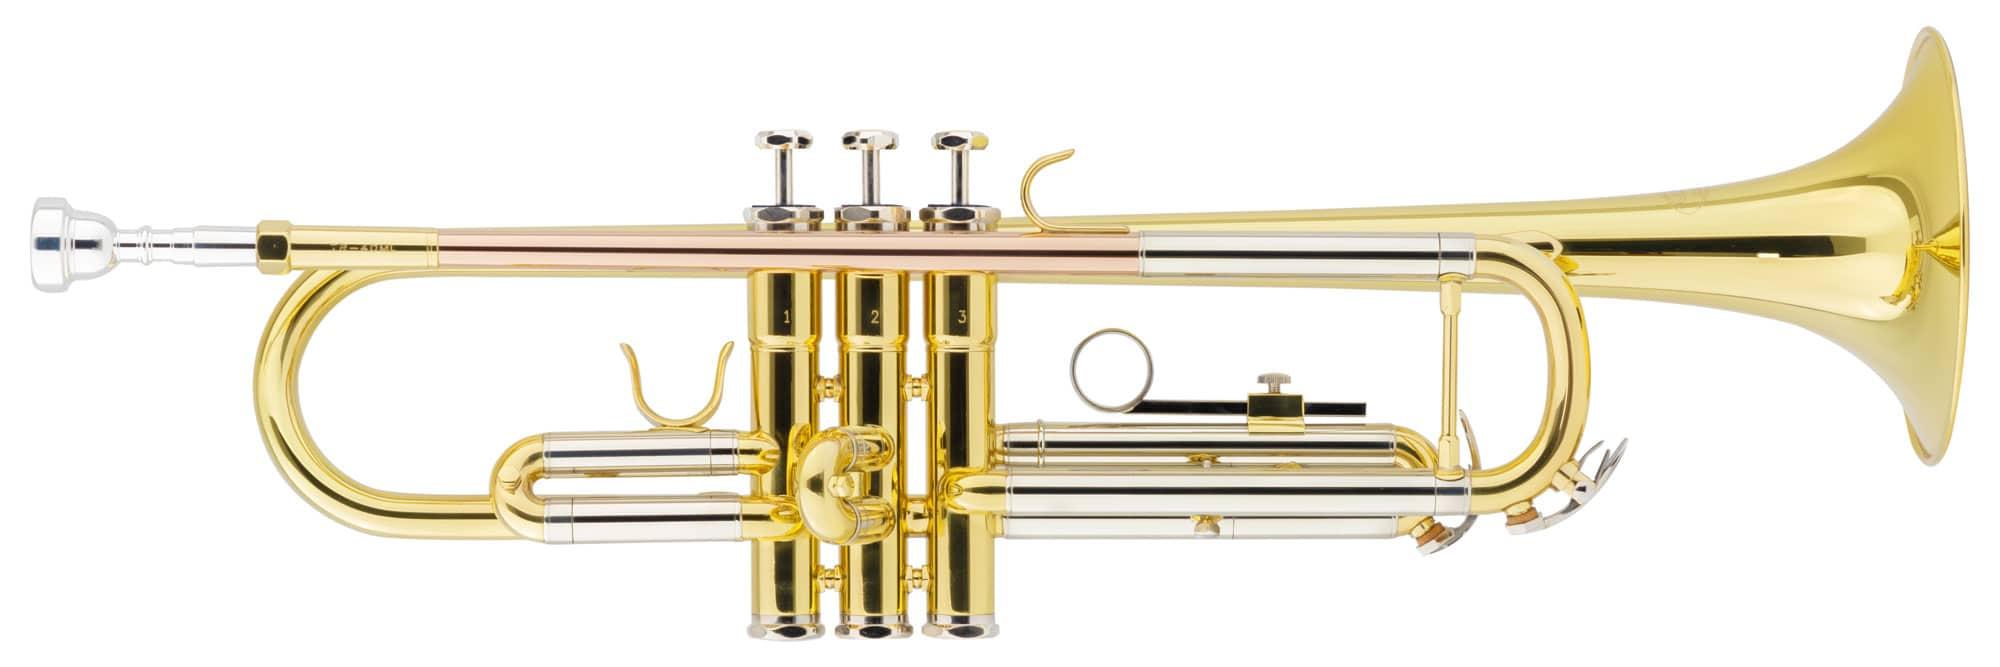 Trompeten - Classic Cantabile TR 40ML Bb Trompete - Onlineshop Musikhaus Kirstein